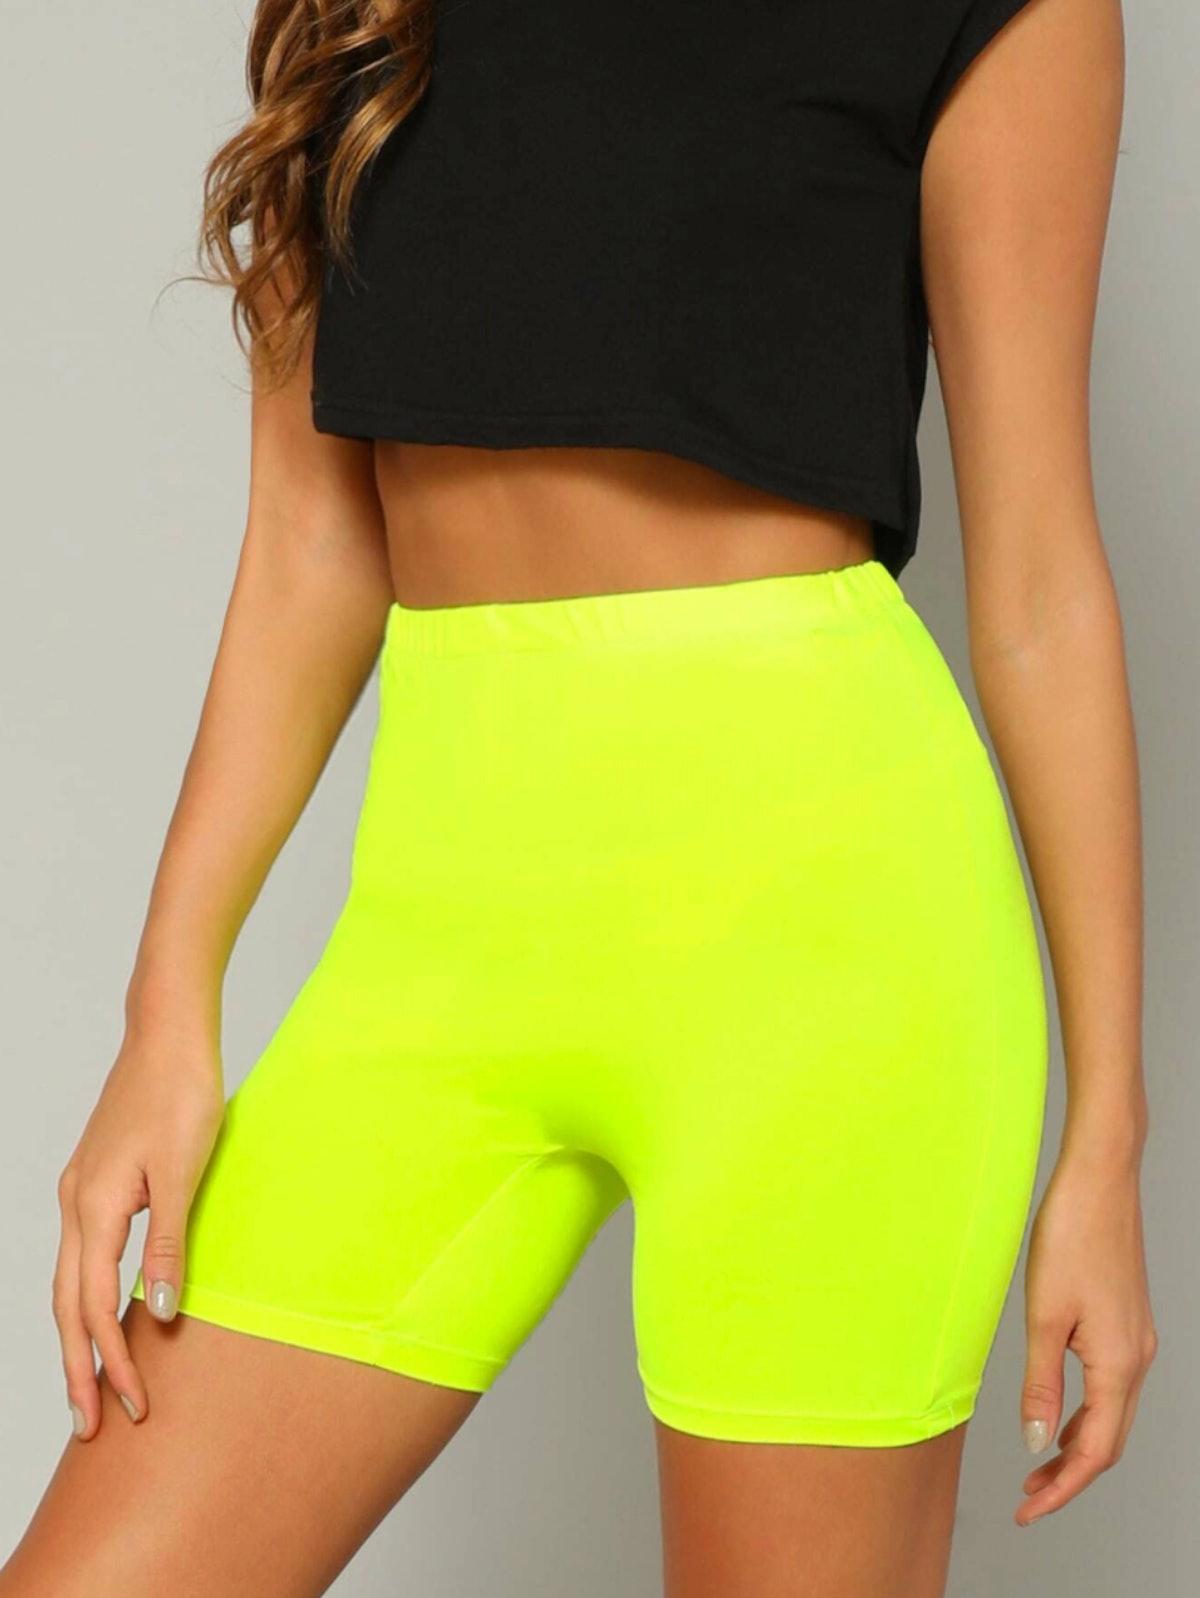 SHEIN Neon Yellow Solid Legging Shorts